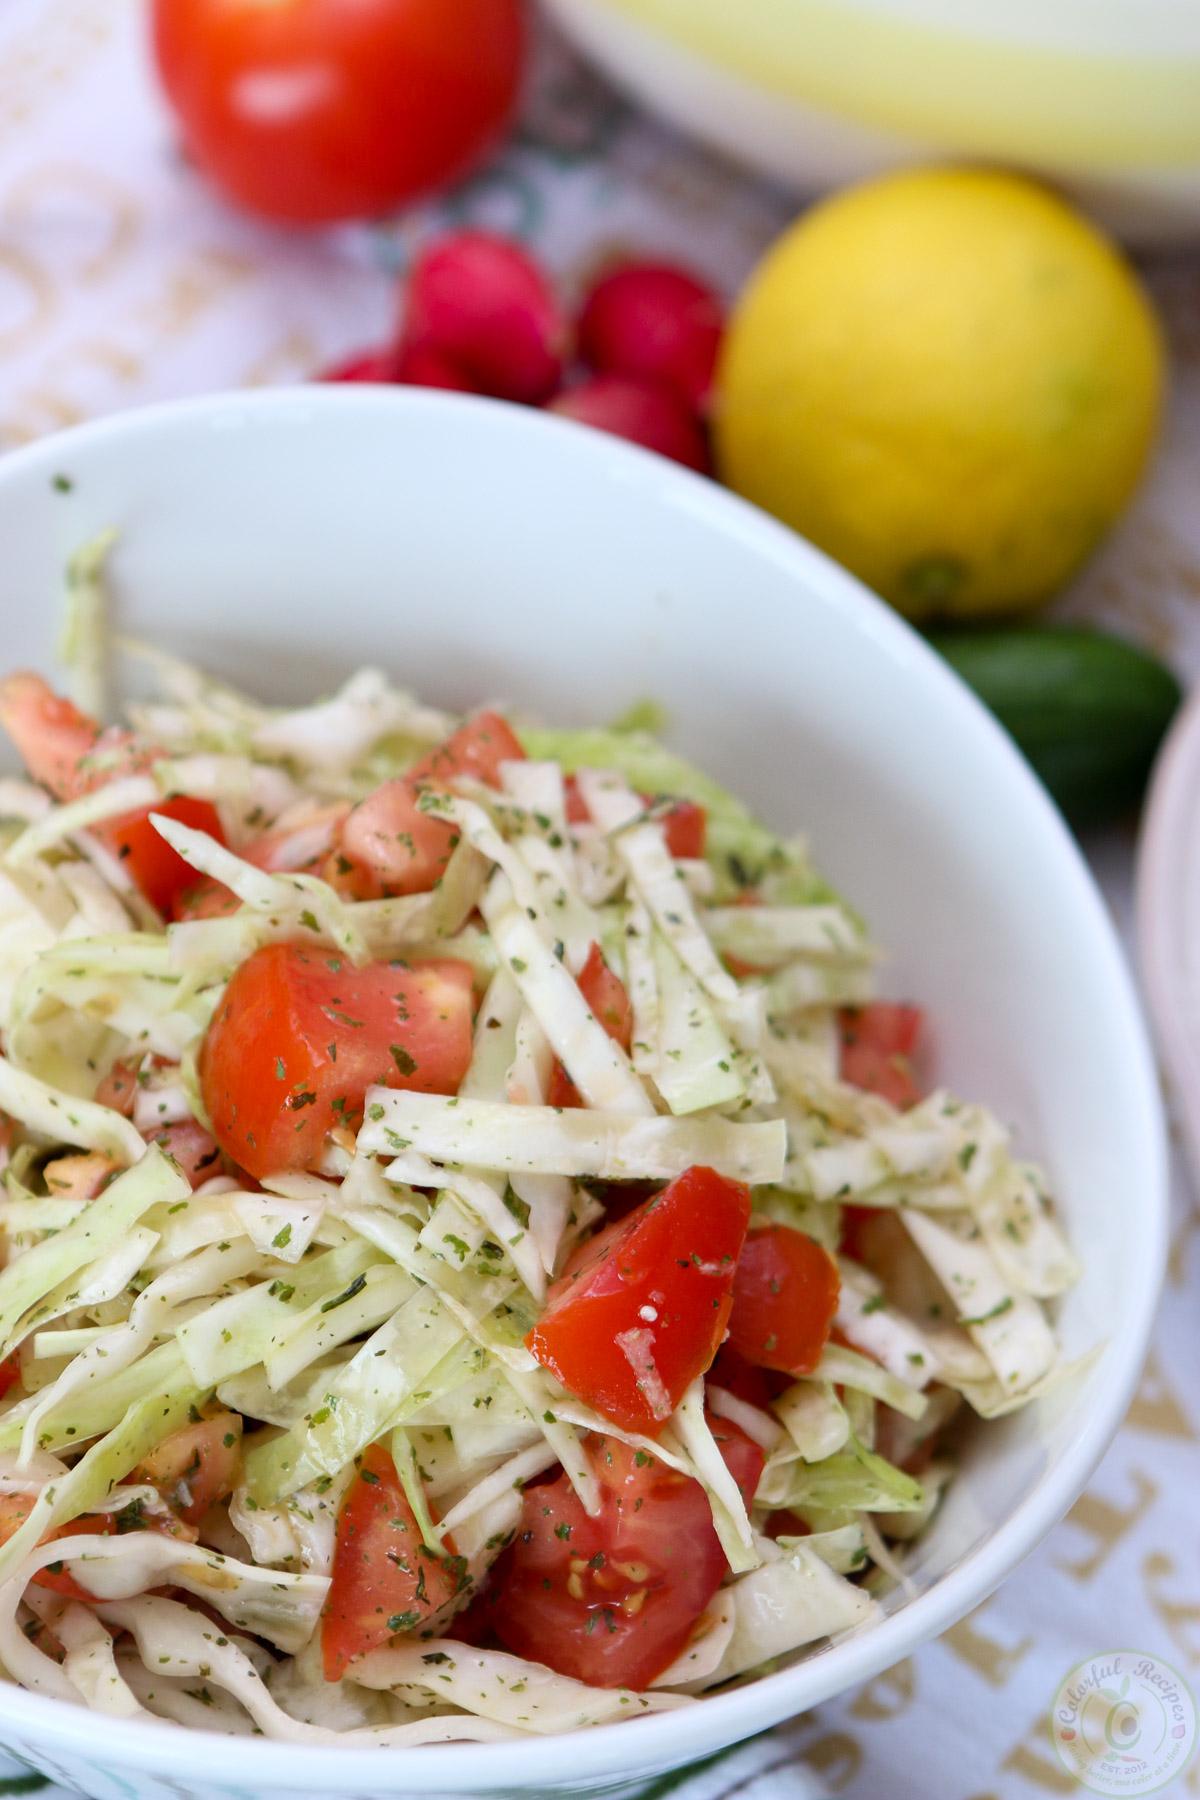 Lebanese Lentil Rice Pilaf (Mdardara) with Cabbage Tomato Salad